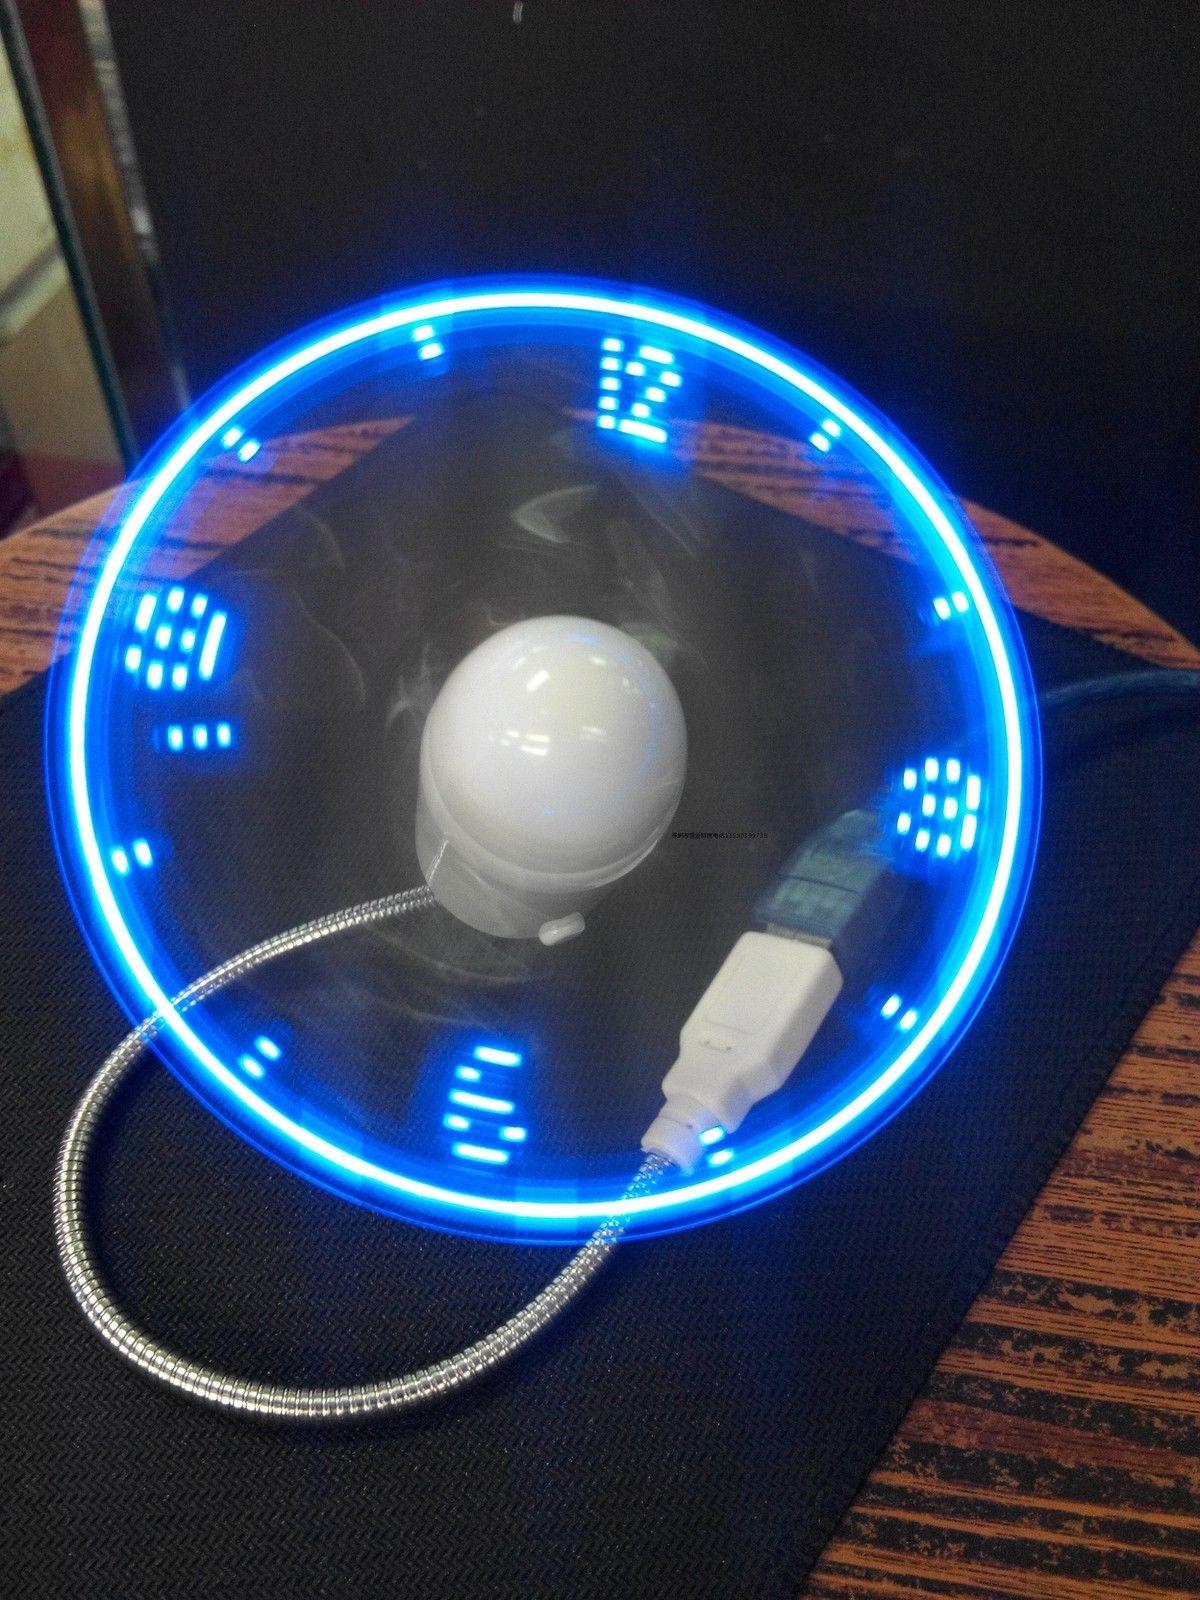 Blue Durable Adjustable USB Gadget Mini Flexible LED Light USB Fan Time Clock Desktop Clock Cool Gadget Time Display